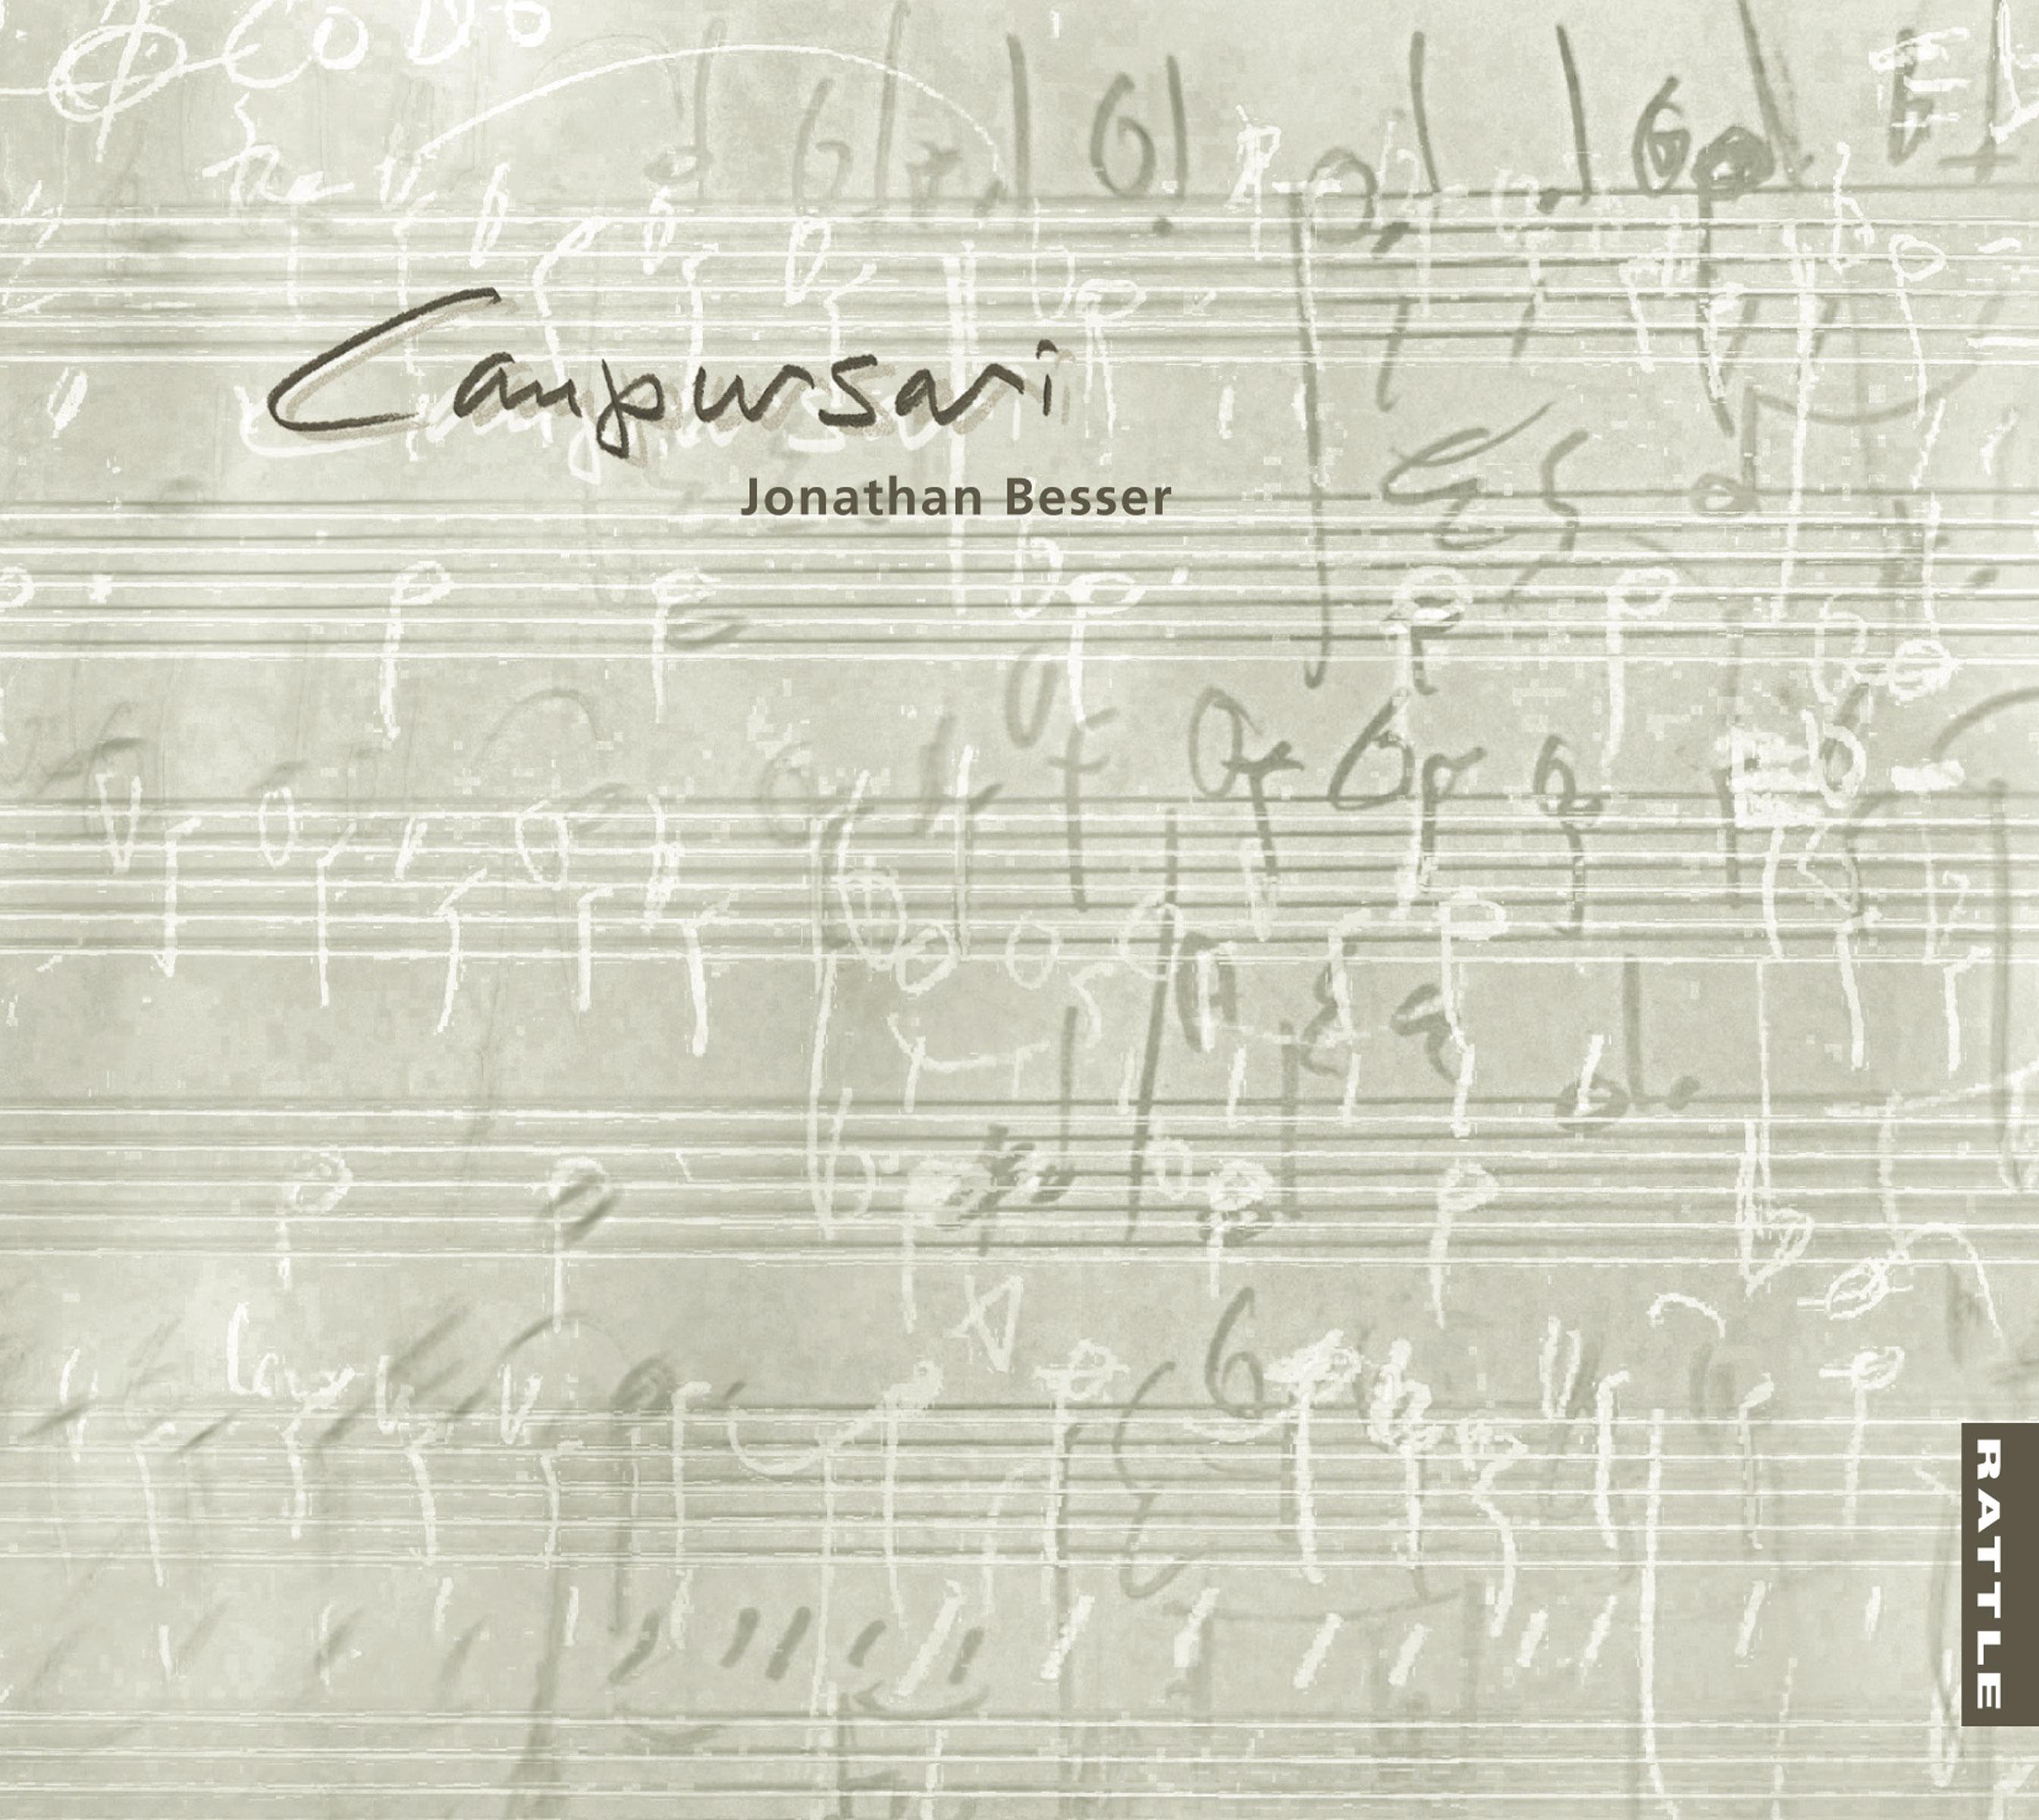 Jonathan Besser   Campursari - downloadable MP3 ALBUM